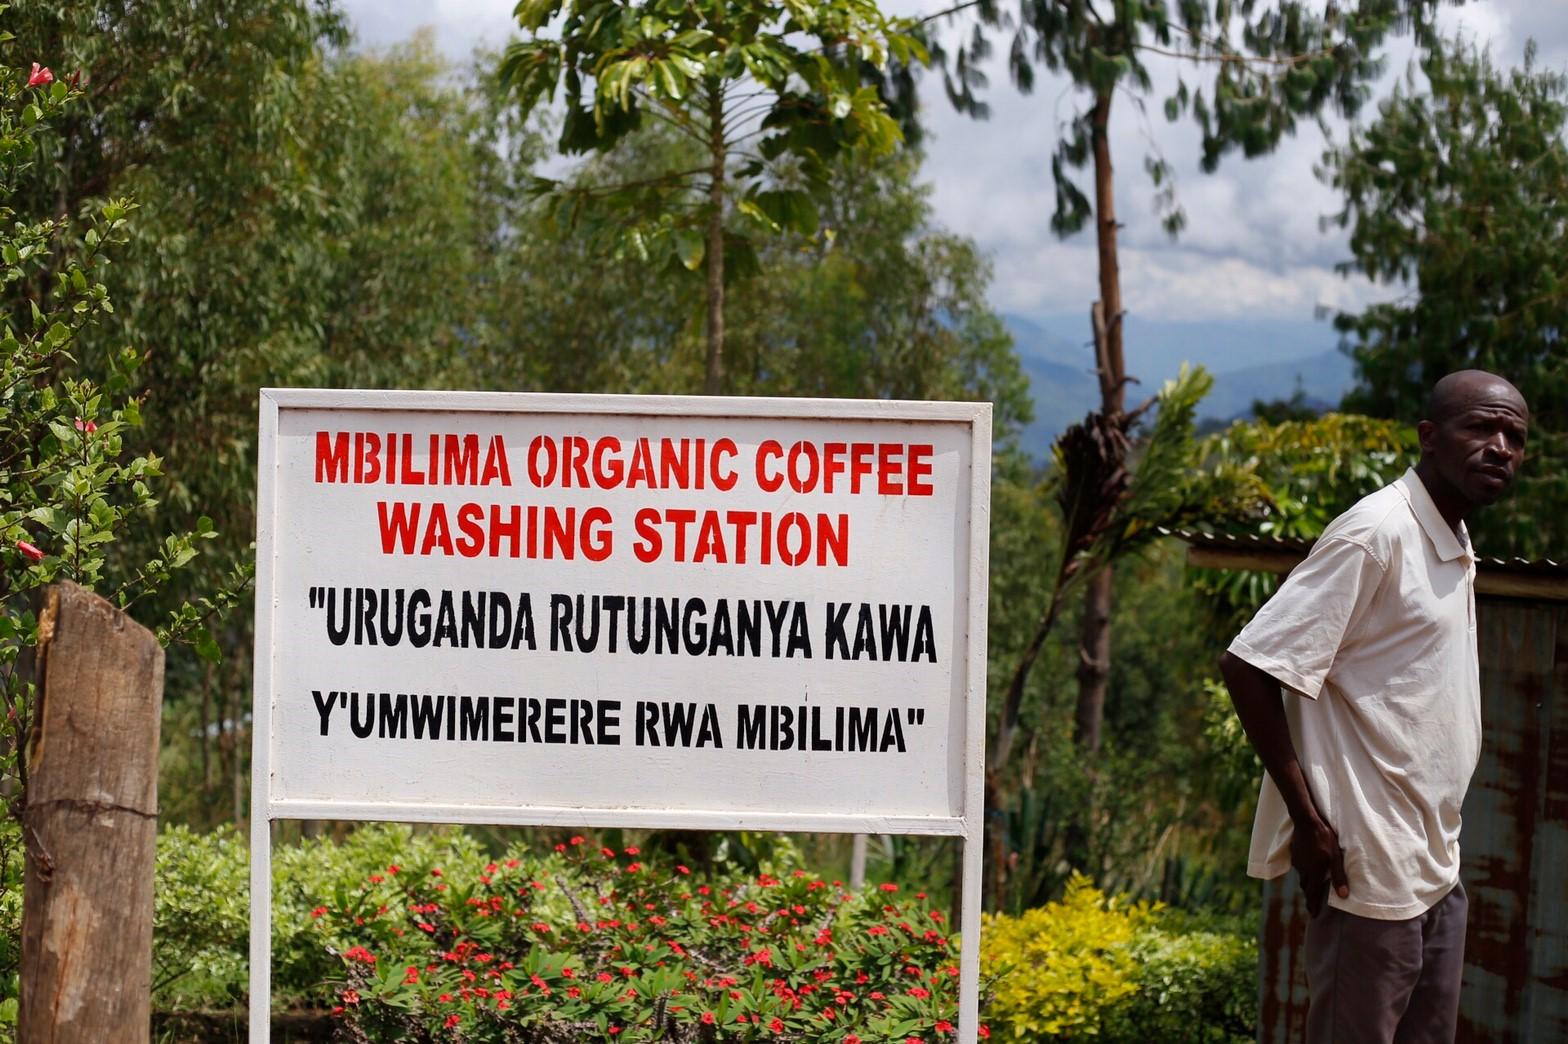 【VISIT TO RWANDA】MBILIMA ORGANIC CWS